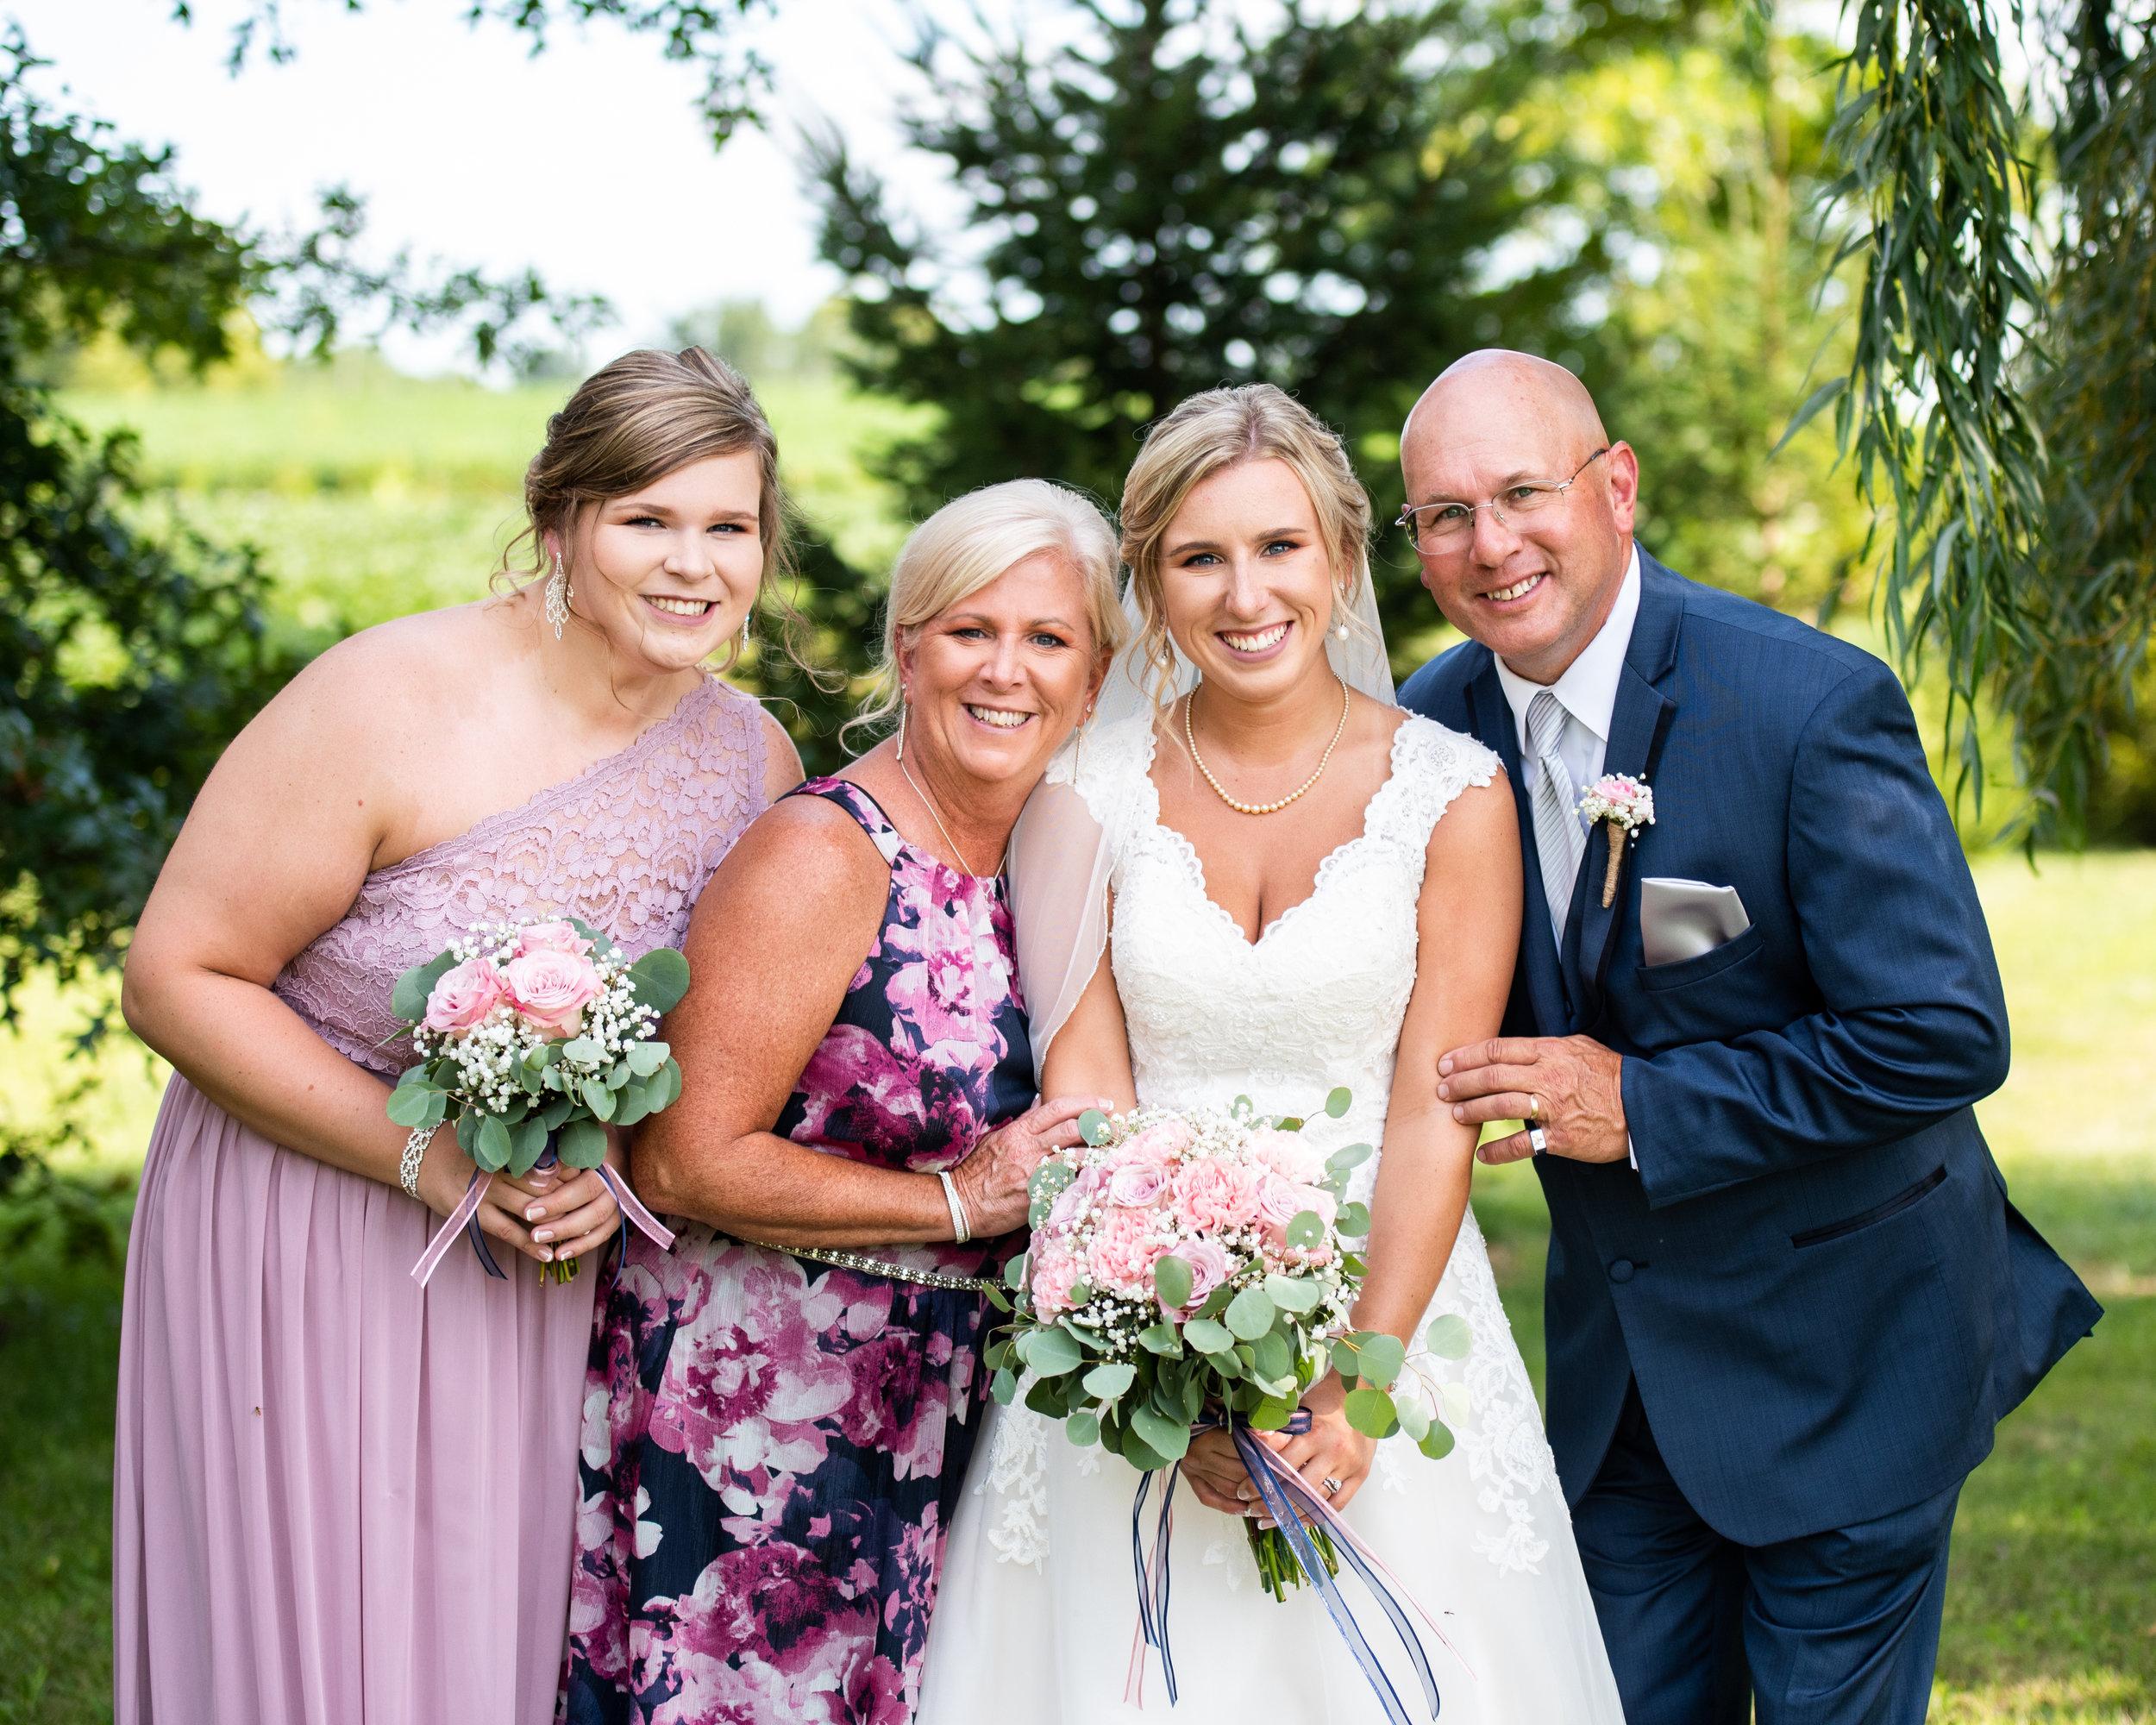 wedding (1 of 1)-106.jpg